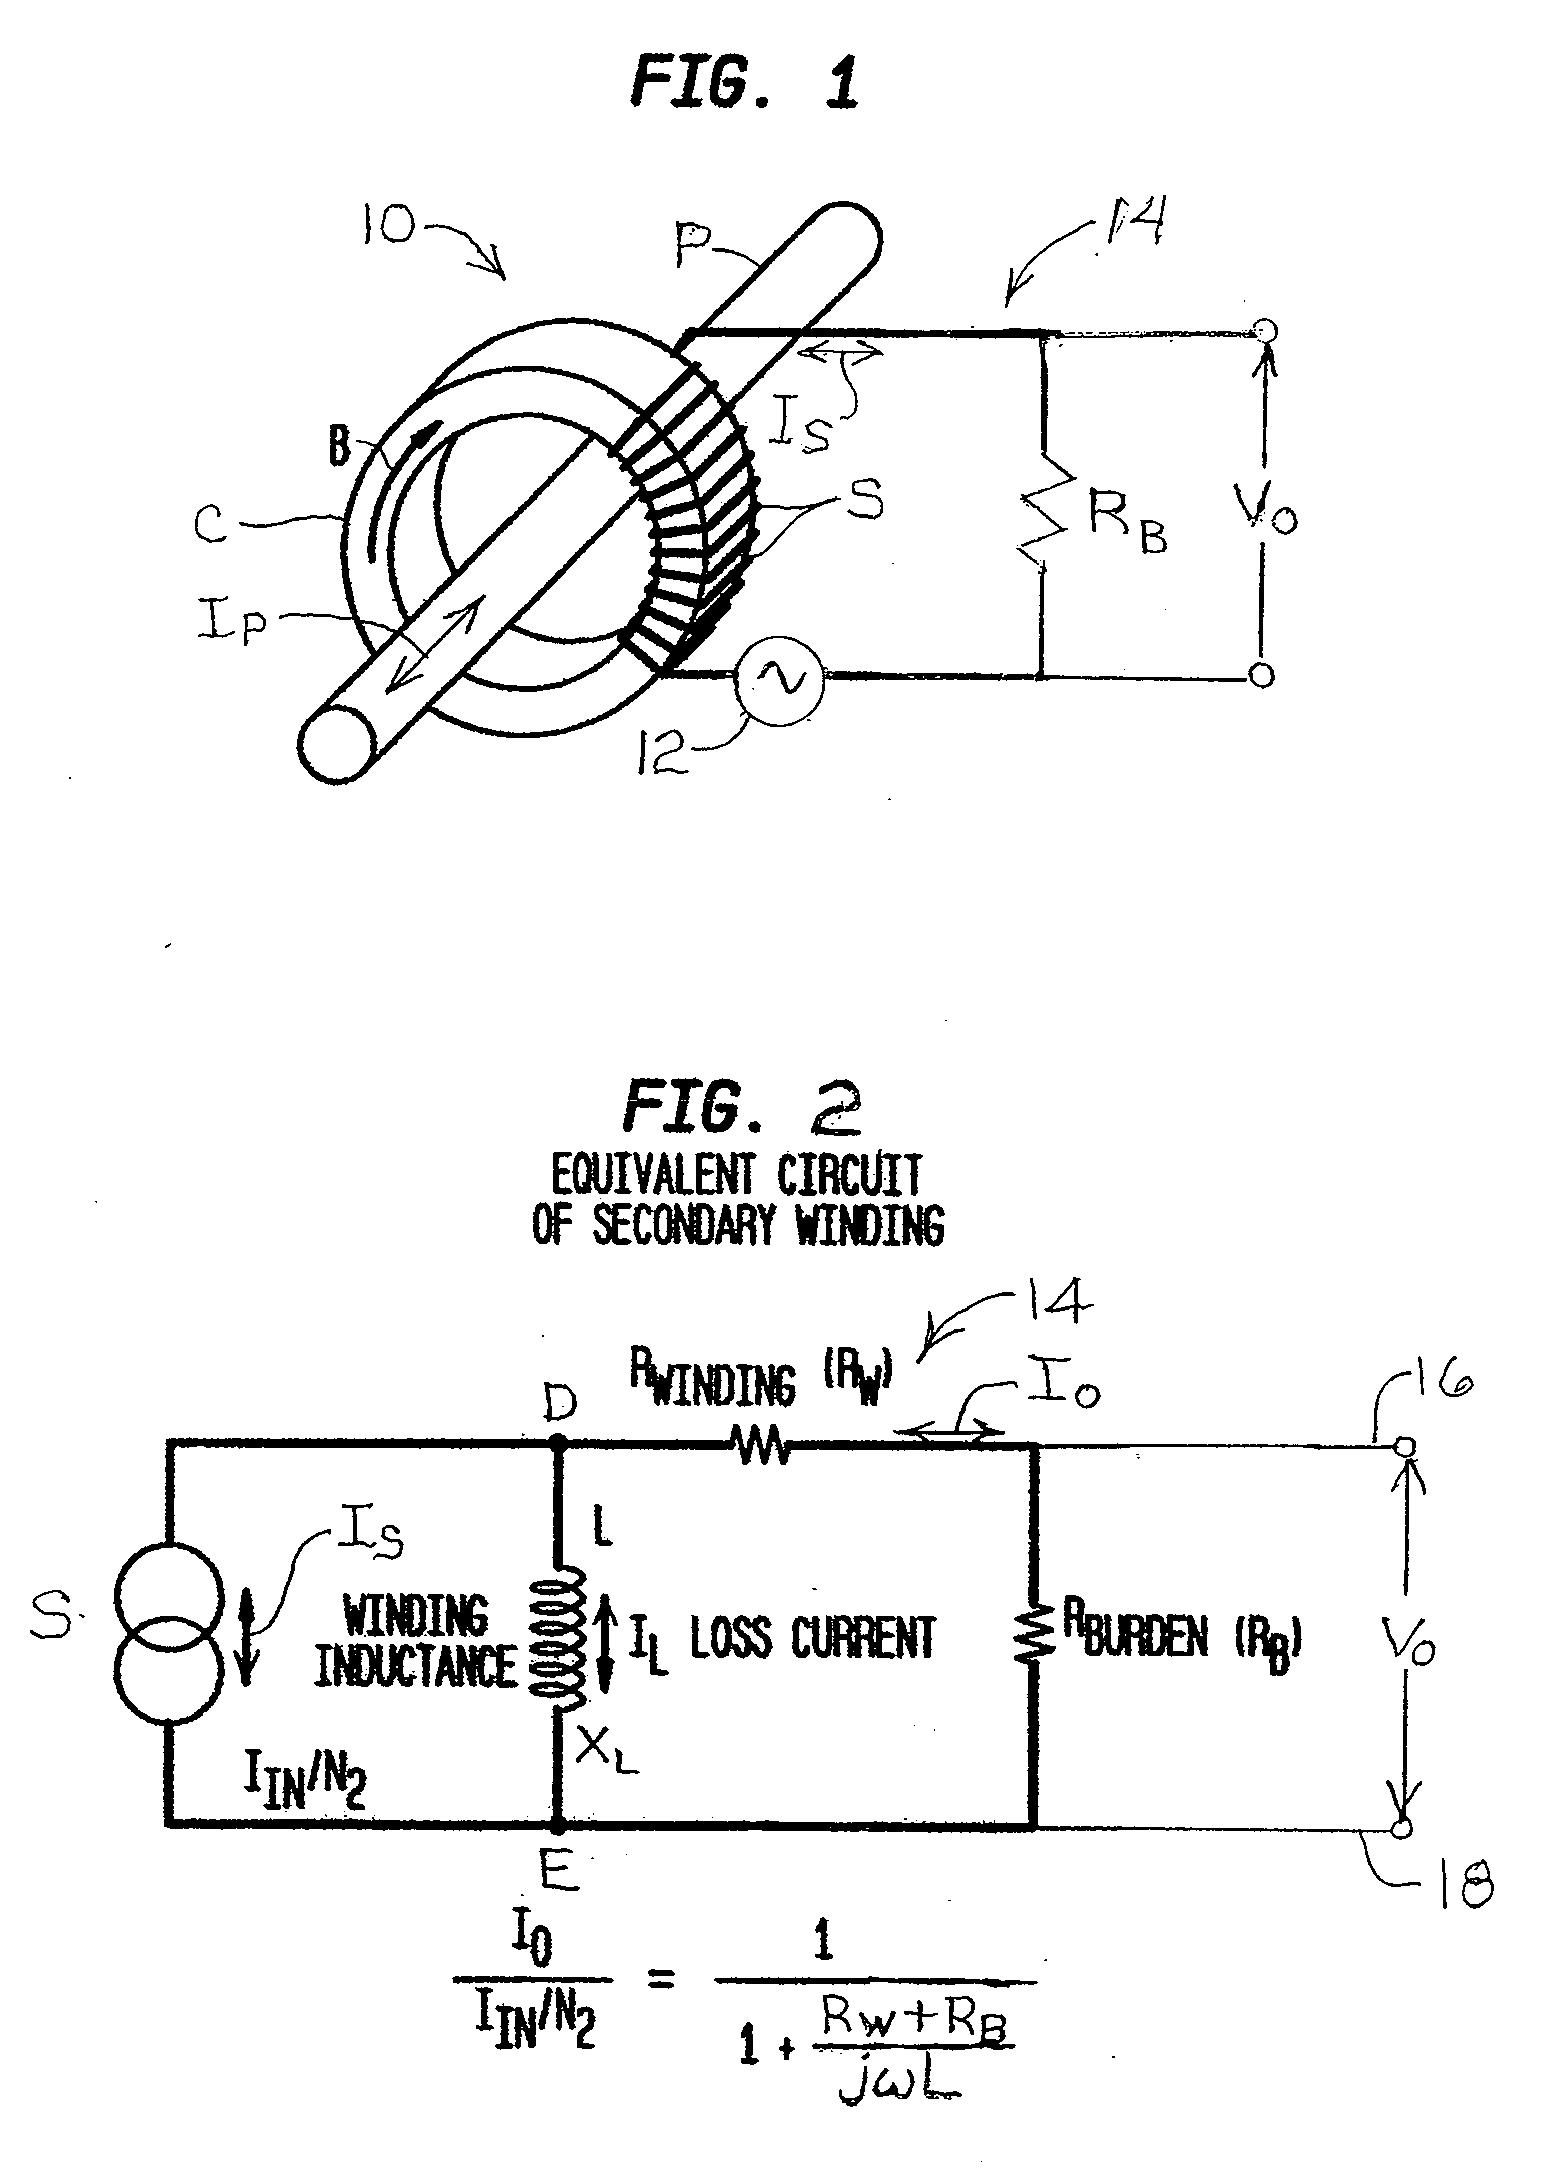 current transformer wiring diagram 2001 nissan pathfinder speaker patent us20120268100 error compensation for